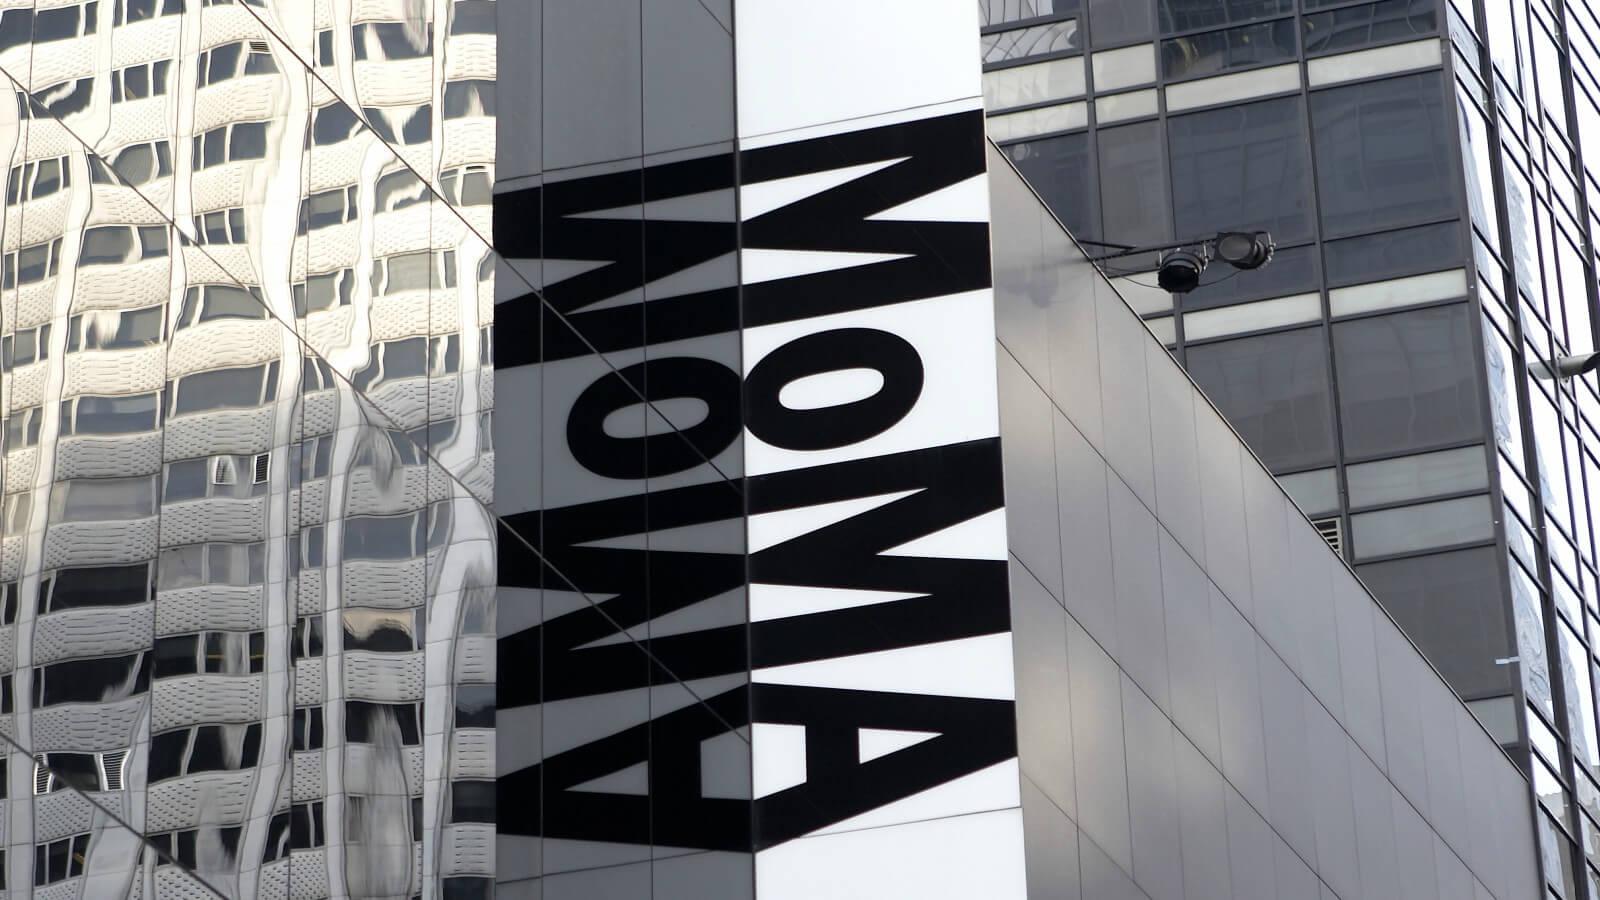 Museo Moma.Moma Artworks 5 Artworks To See